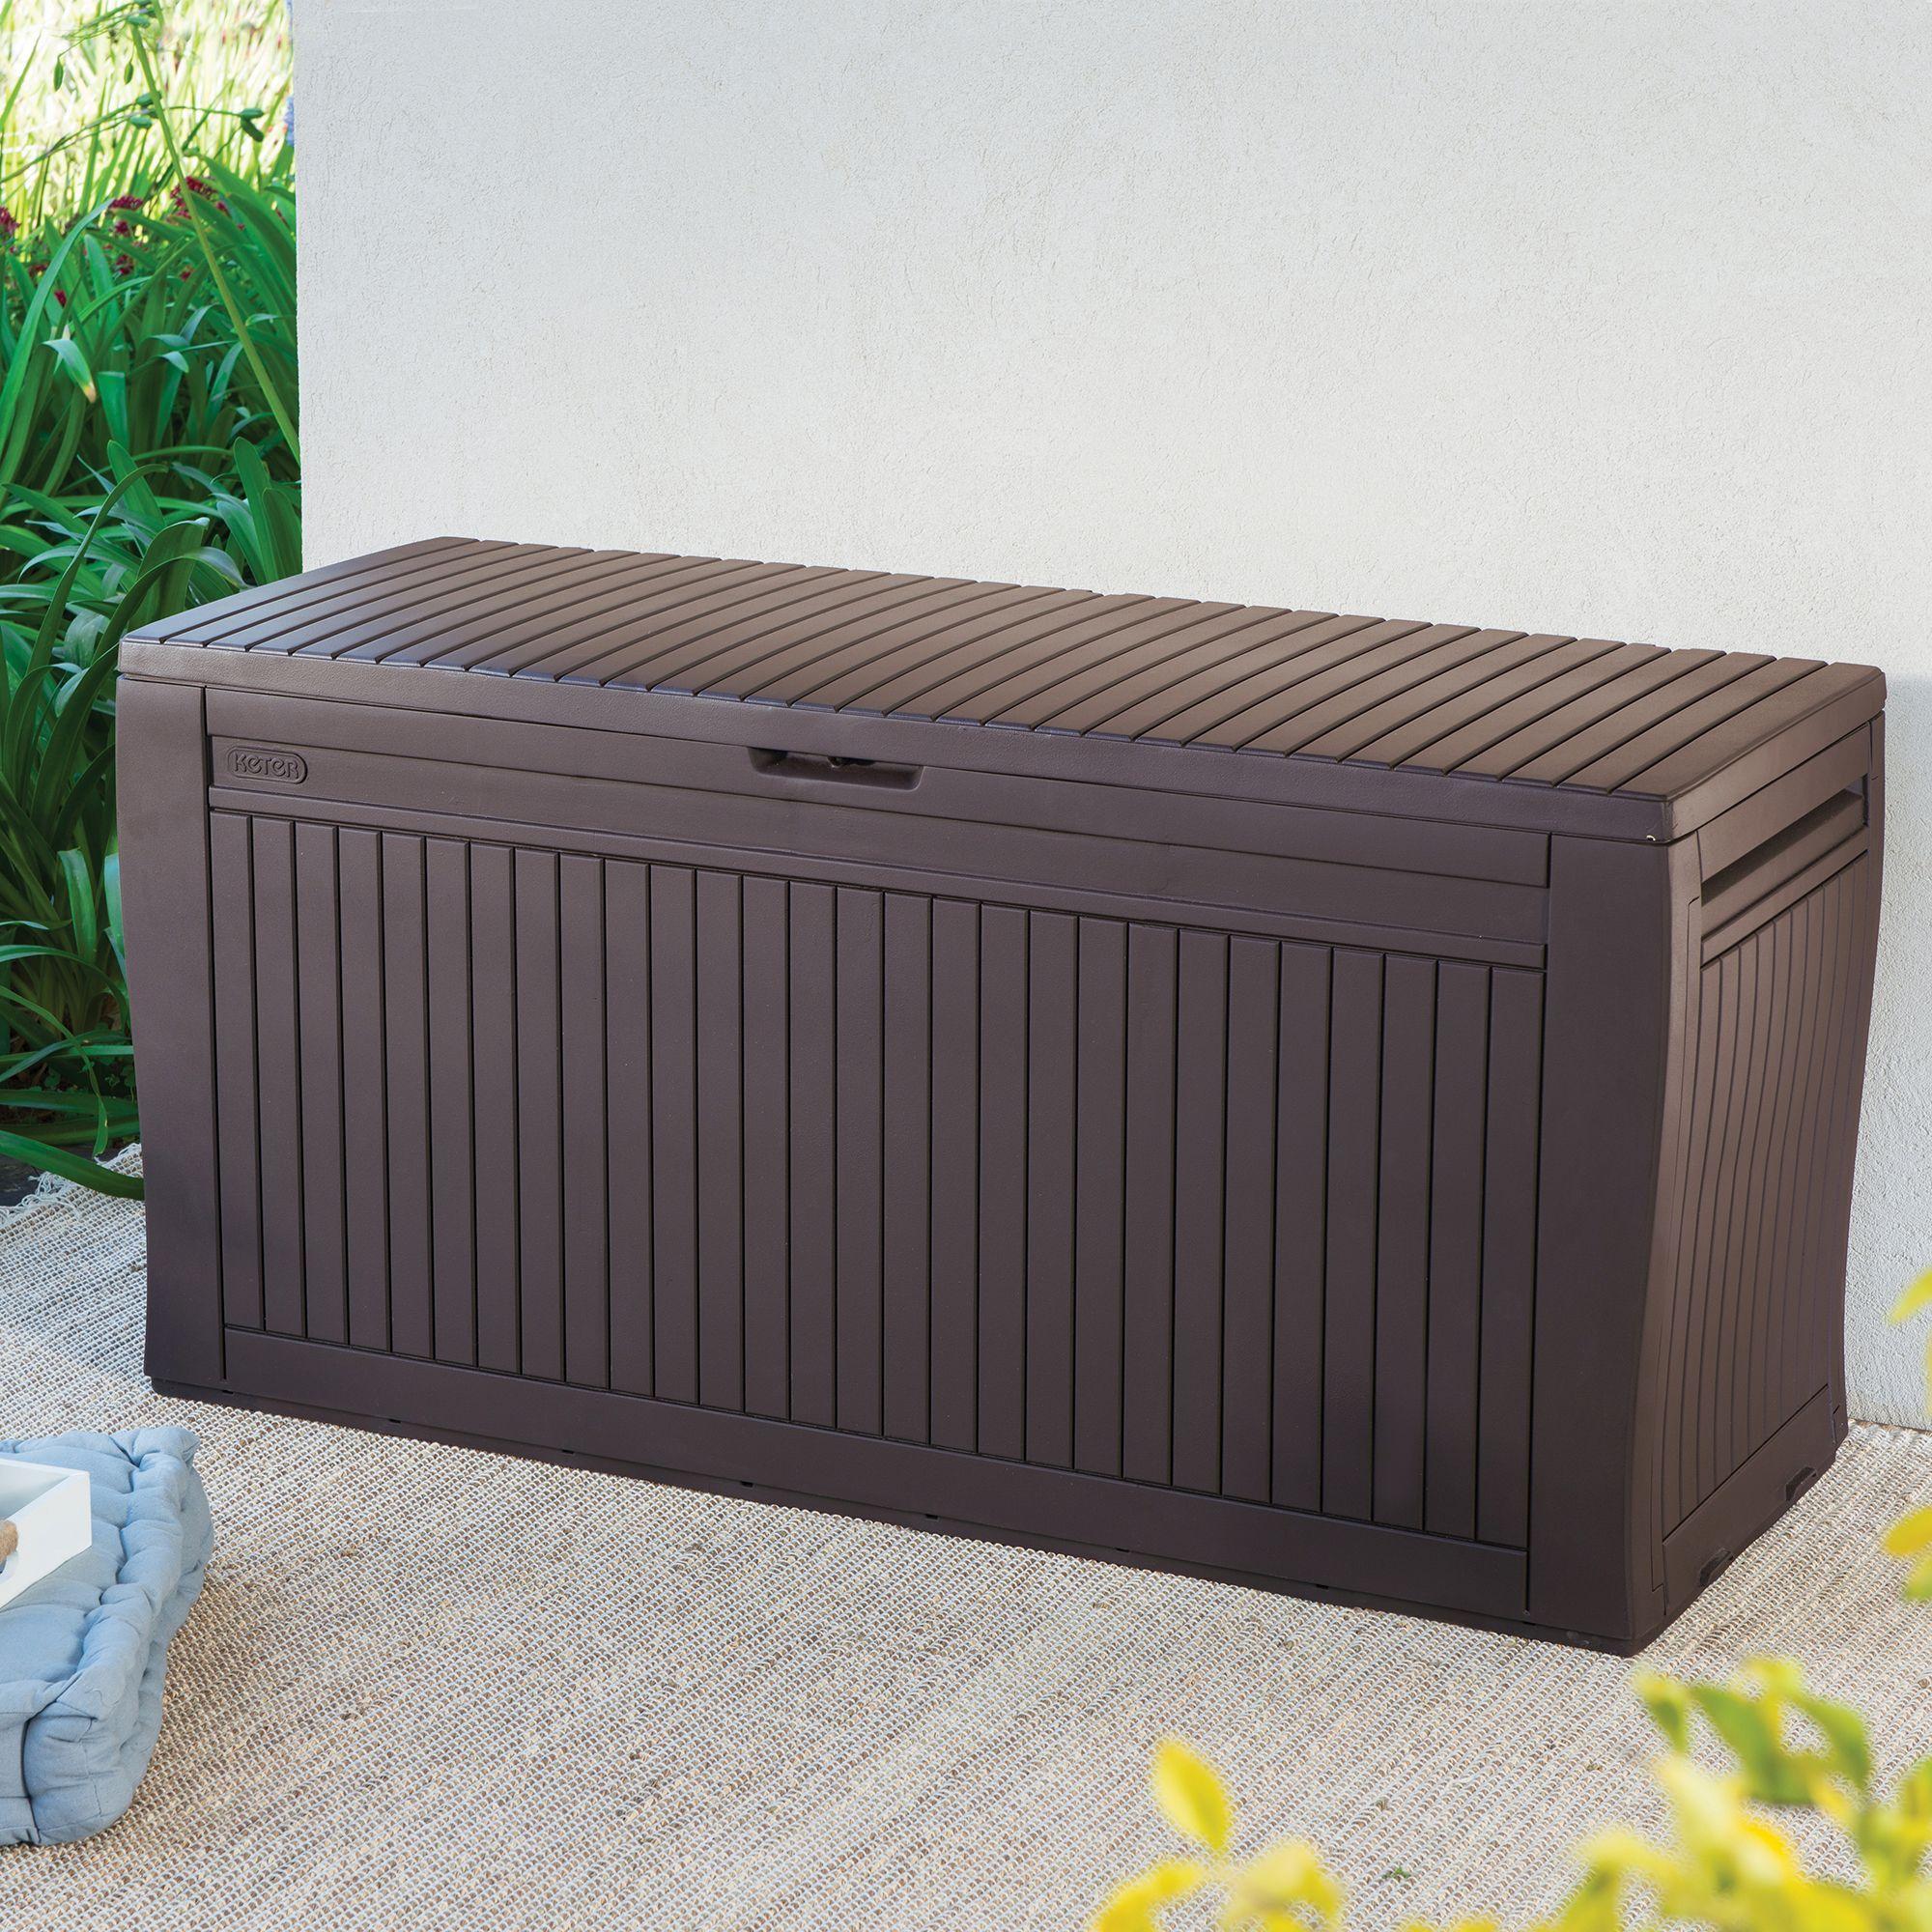 Comfy Wood Effect Plastic Patio Storage Box   Departments   DIY at B&Q